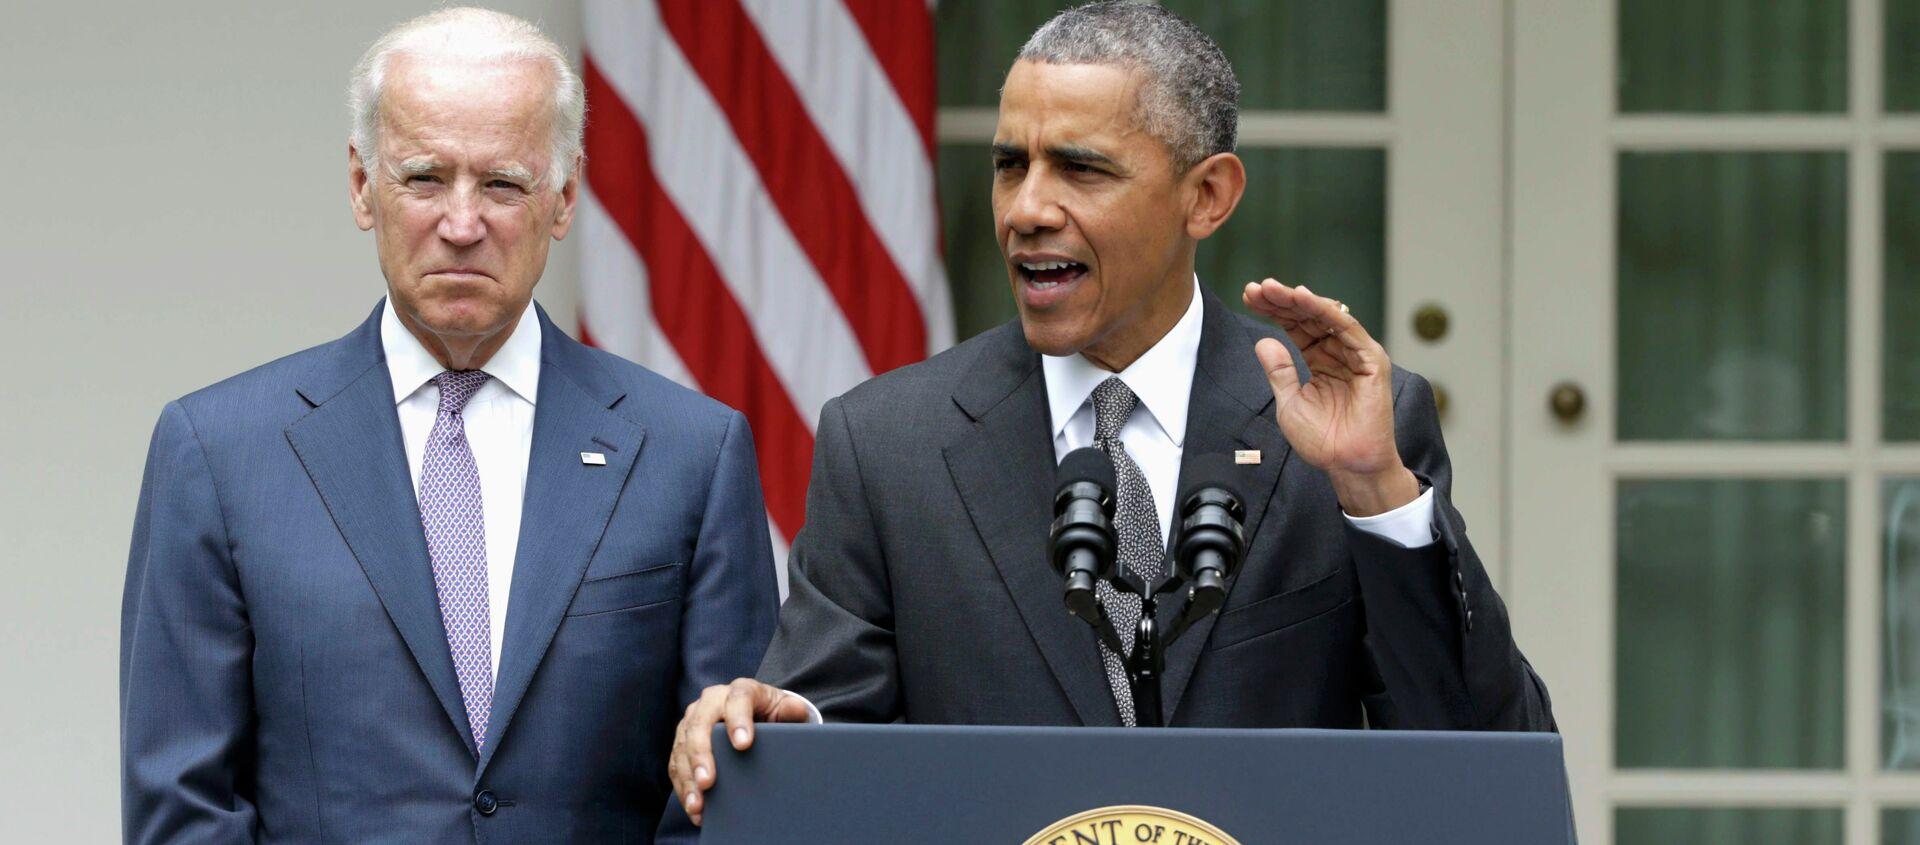 U.S. President Barack Obama (R) delivers remarks next to Vice President Joe Biden - Sputnik Mundo, 1920, 25.01.2021